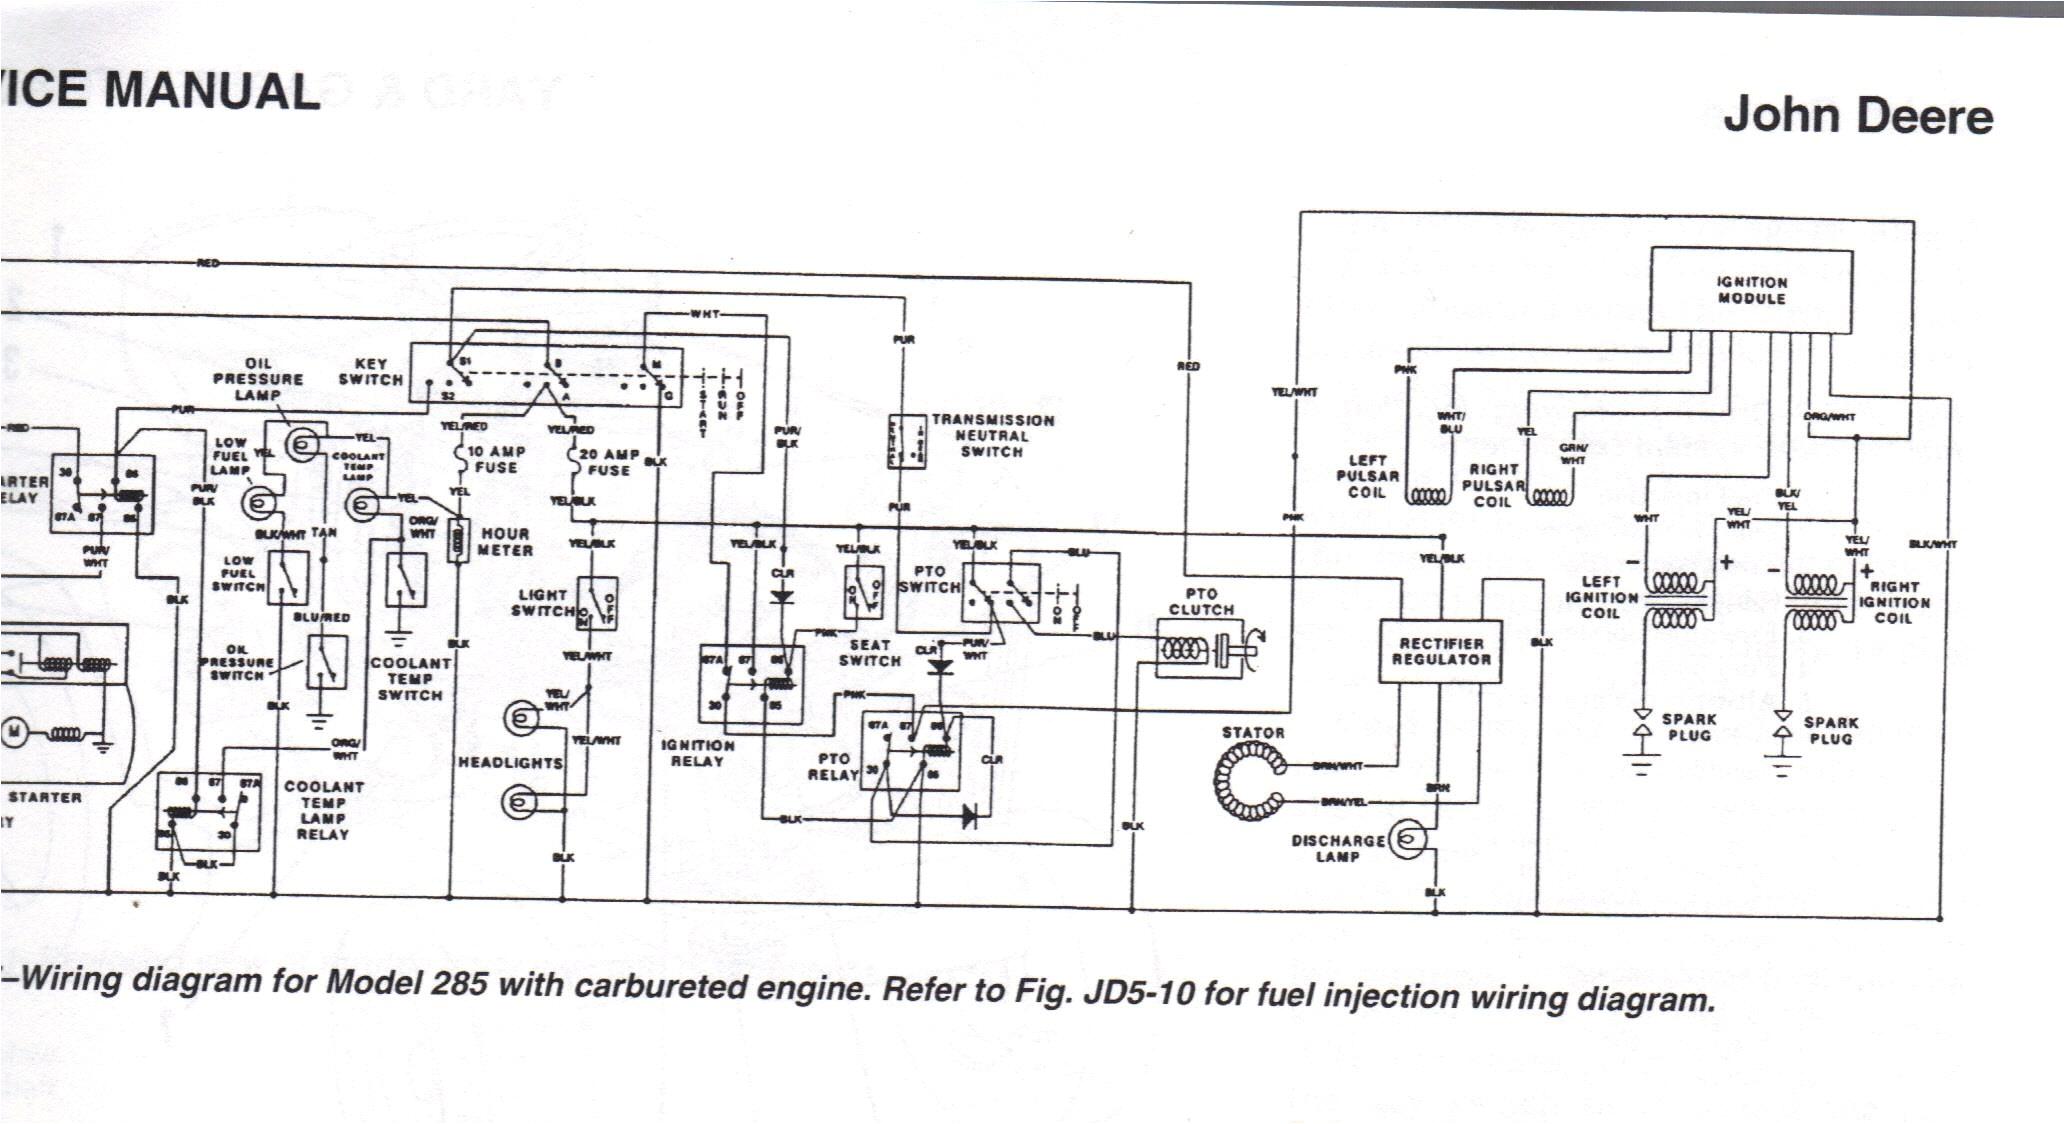 john deere lx280 wiring diagram wiring diagram techniclx280 wiring diagram 2